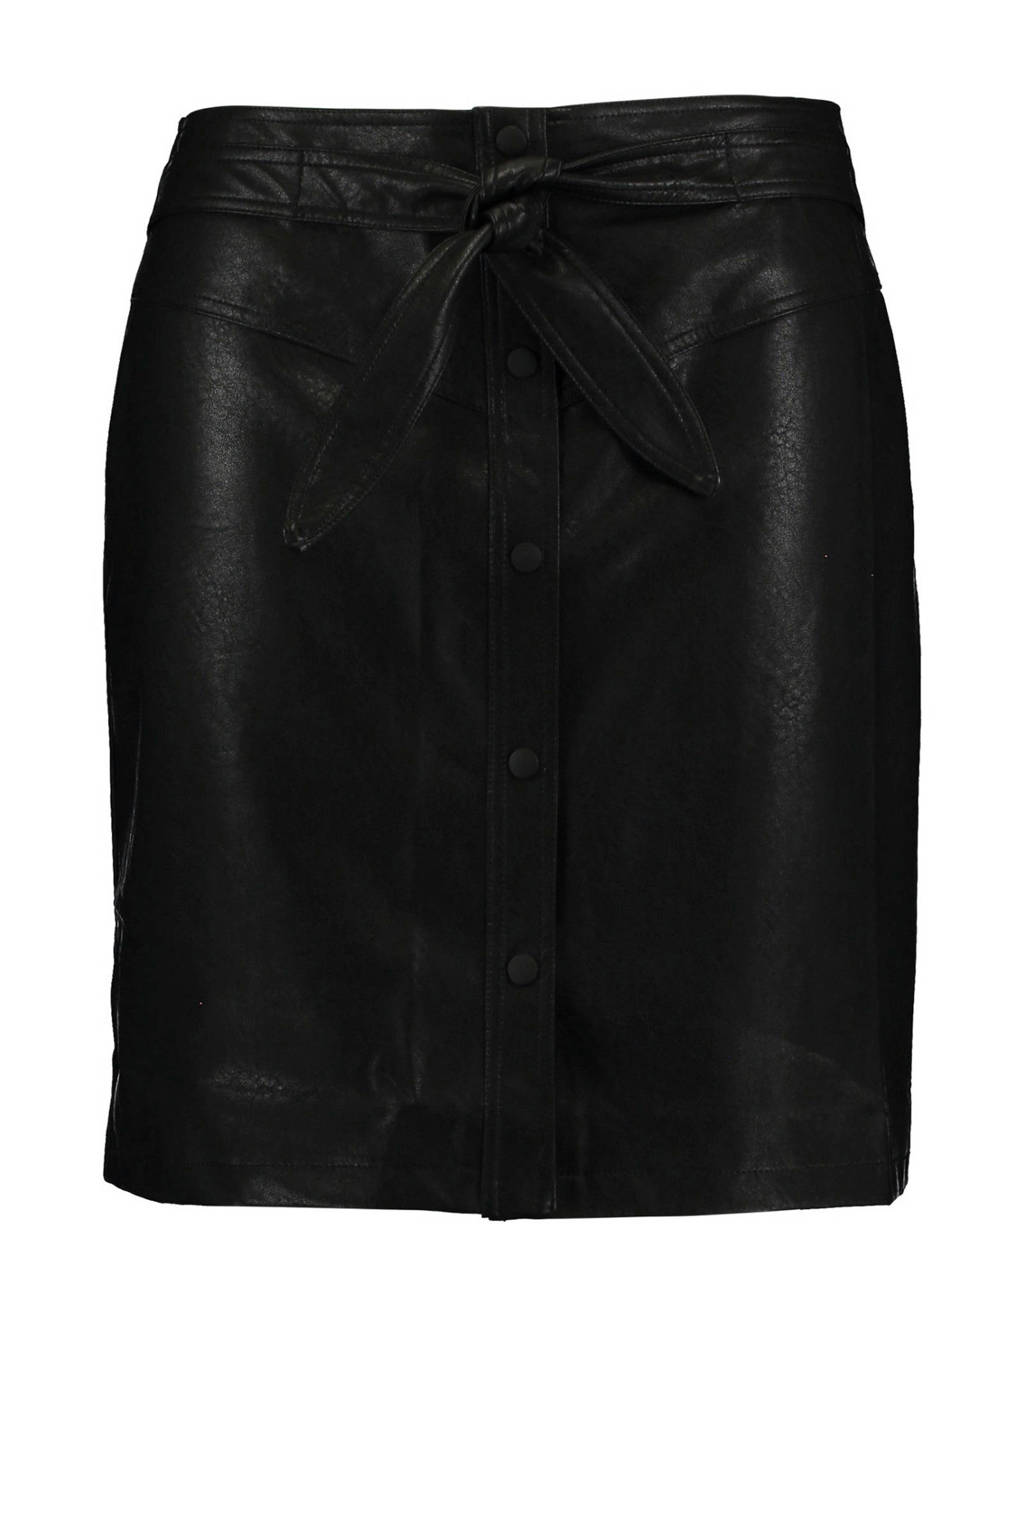 z-one coated rok Lia zwart, Zwart